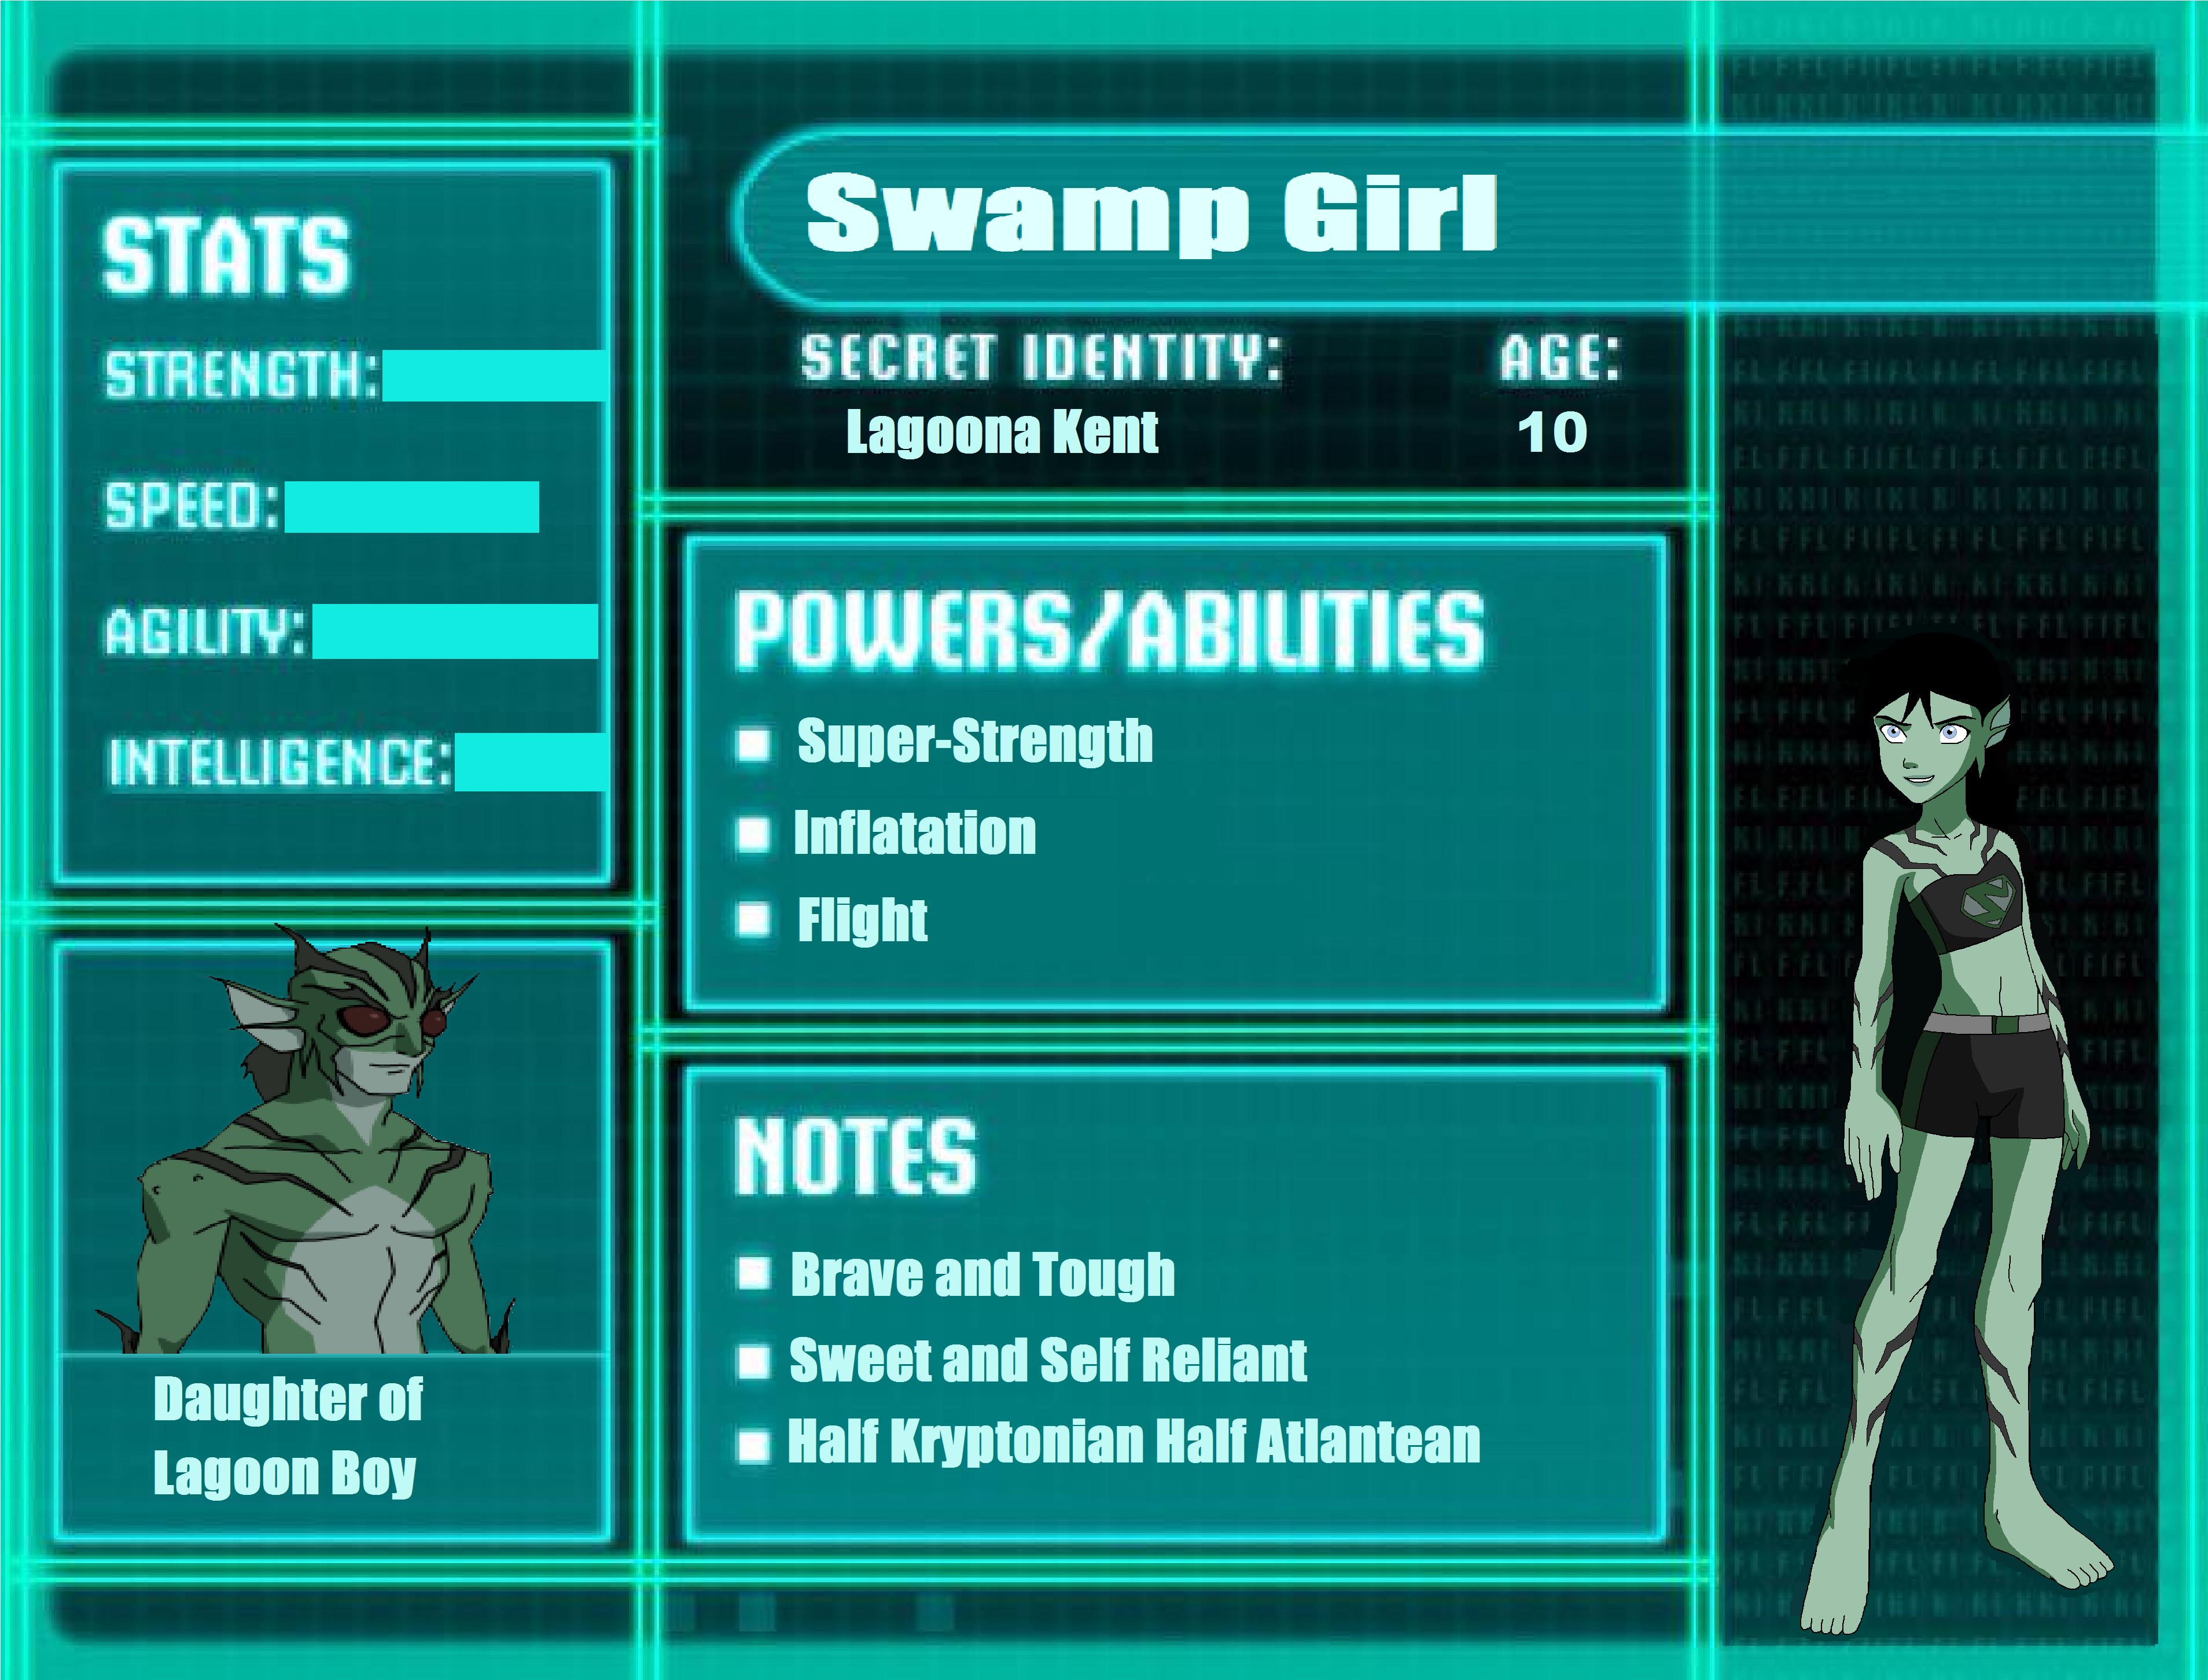 Swamp girl s stat